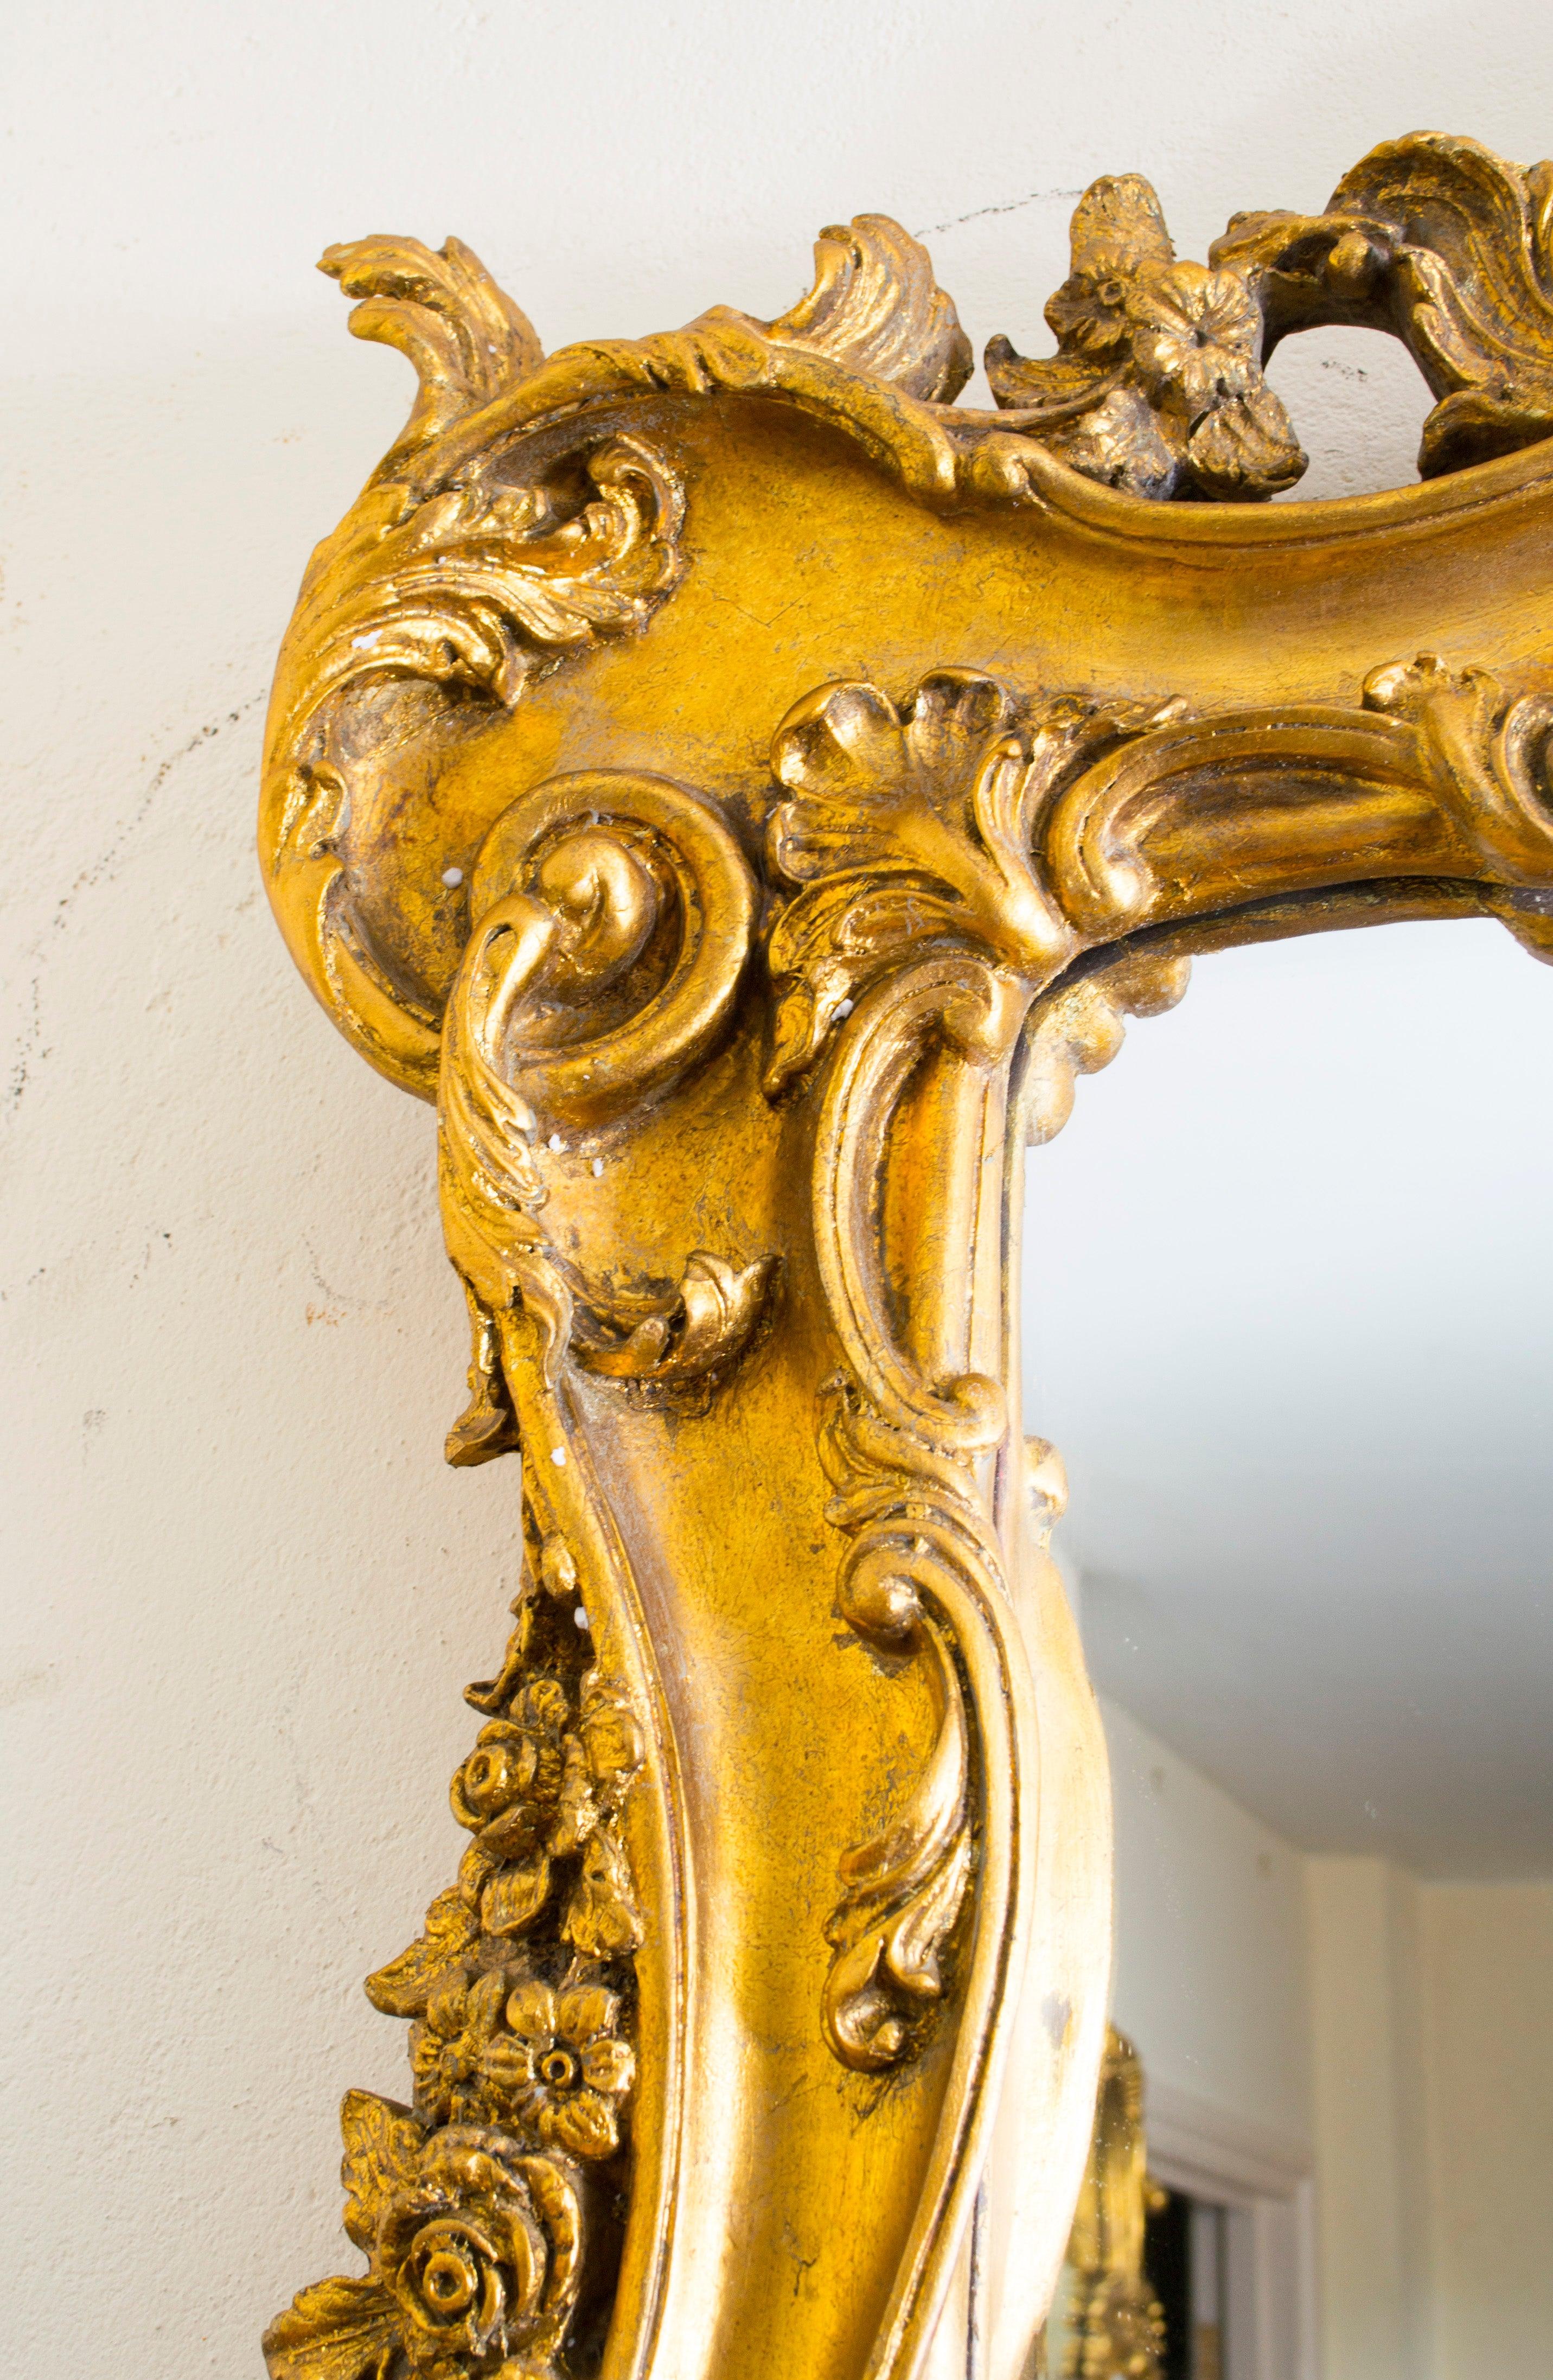 Stunning Large Rectangular Decorative Gilded Mirror 181 x 102 cm For ...